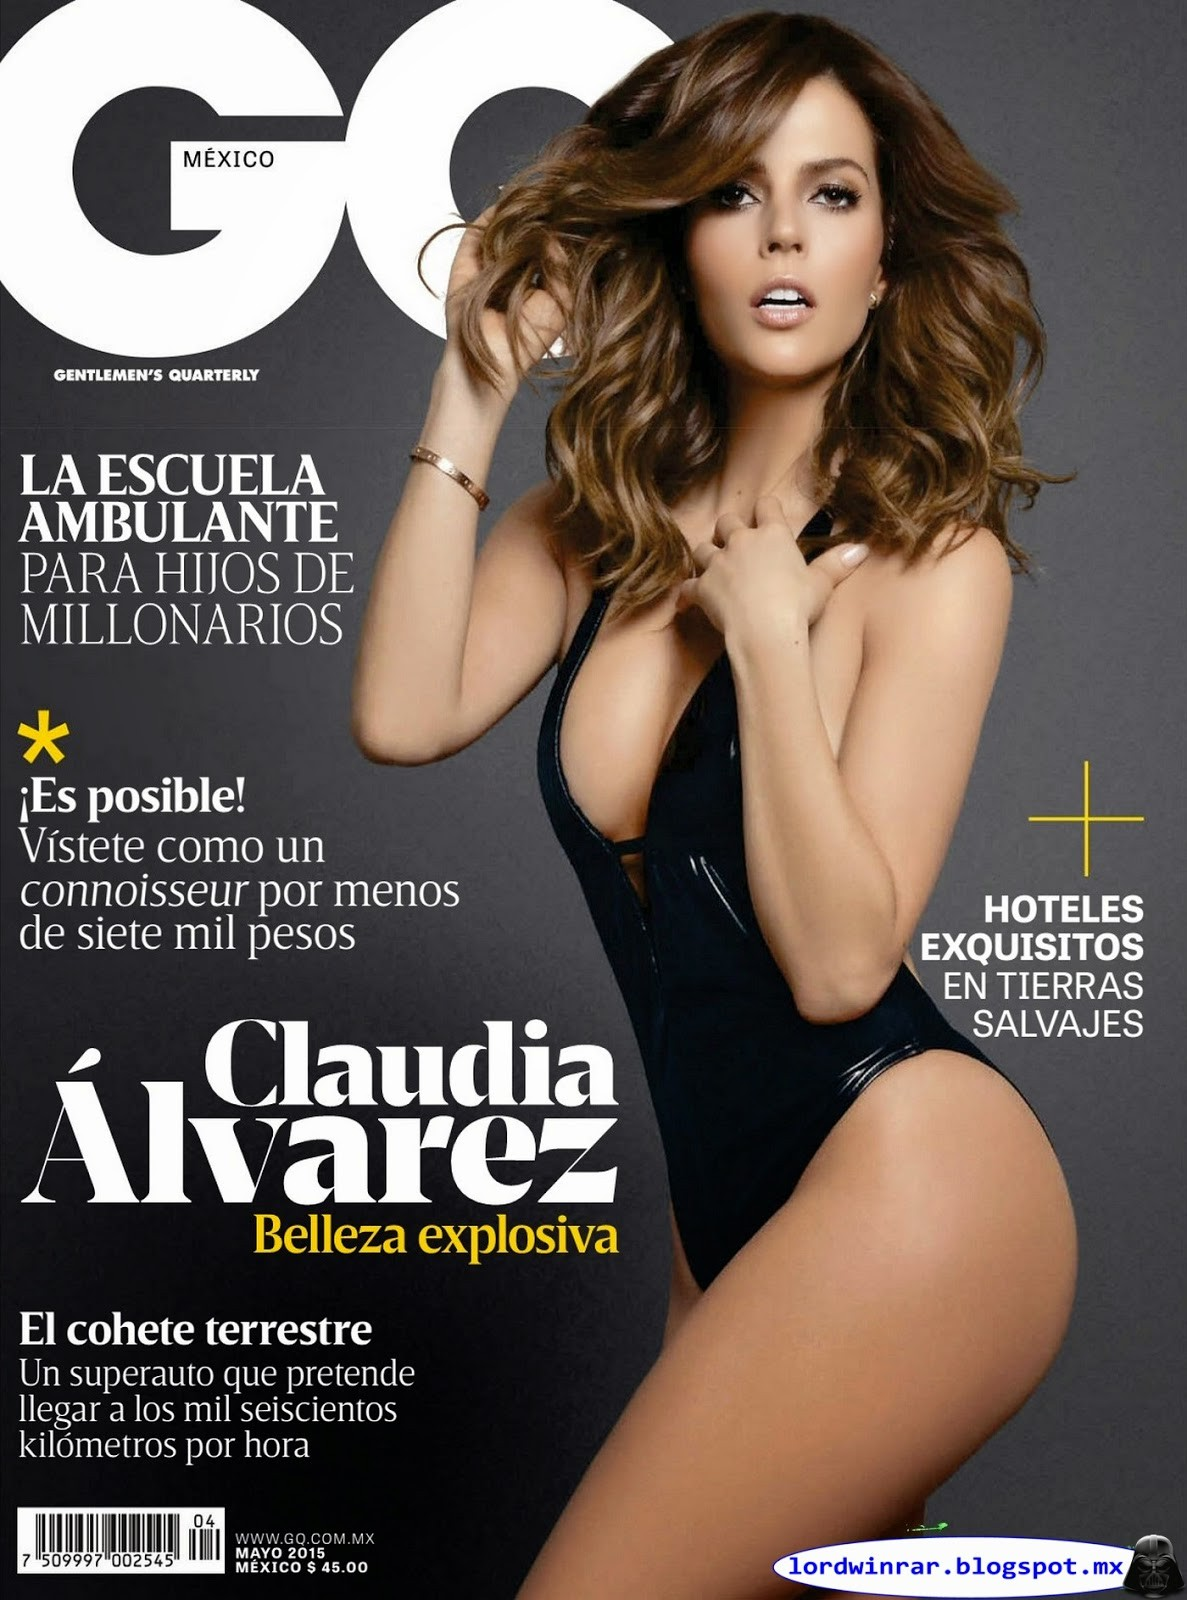 Claudia Alvarez mamadas